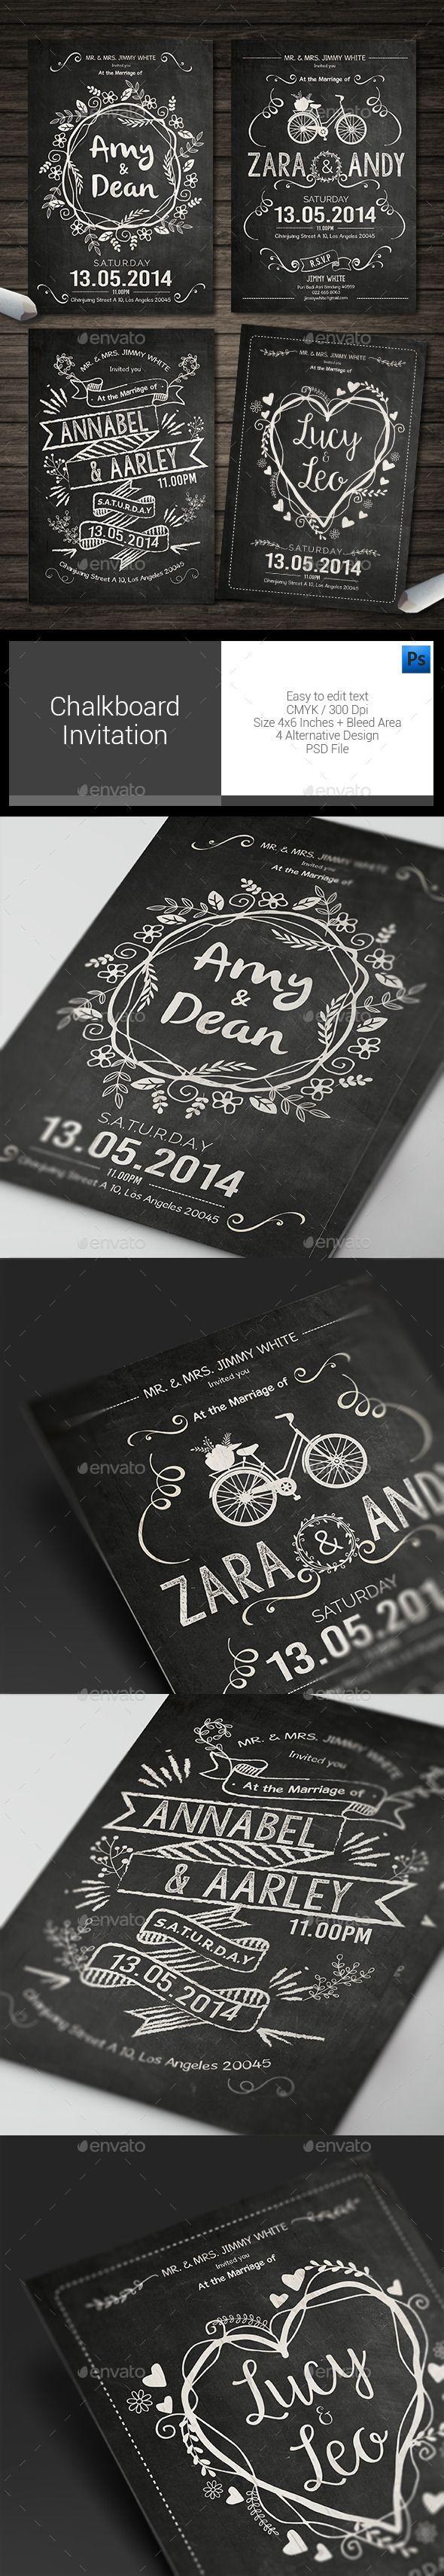 Chalkboard Invitation Template #design Download: http://graphicriver.net/item/chalkboard-invitation/12503465?ref=ksioks